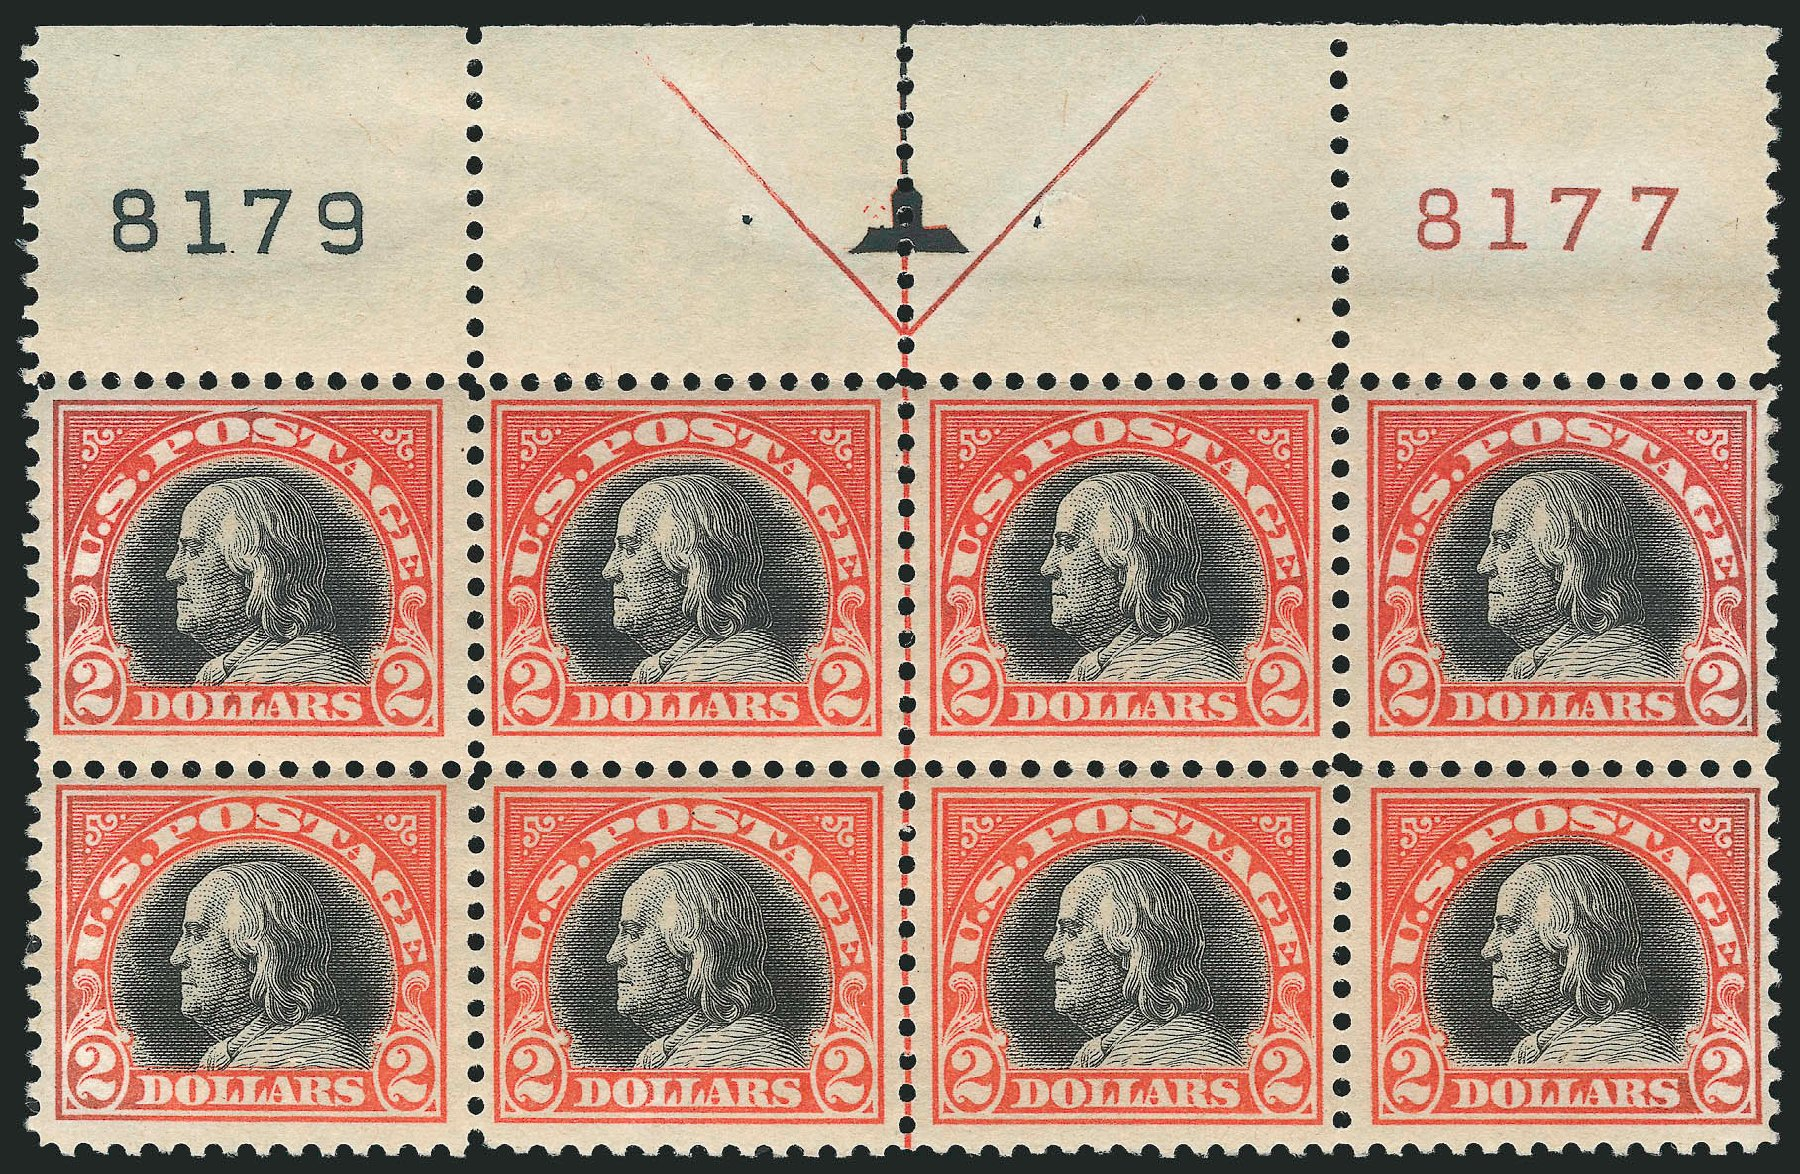 Value of US Stamp Scott Cat. 523: US$2.00 1918 Franklin Perf 11. Robert Siegel Auction Galleries, Feb 2015, Sale 1093, Lot 485